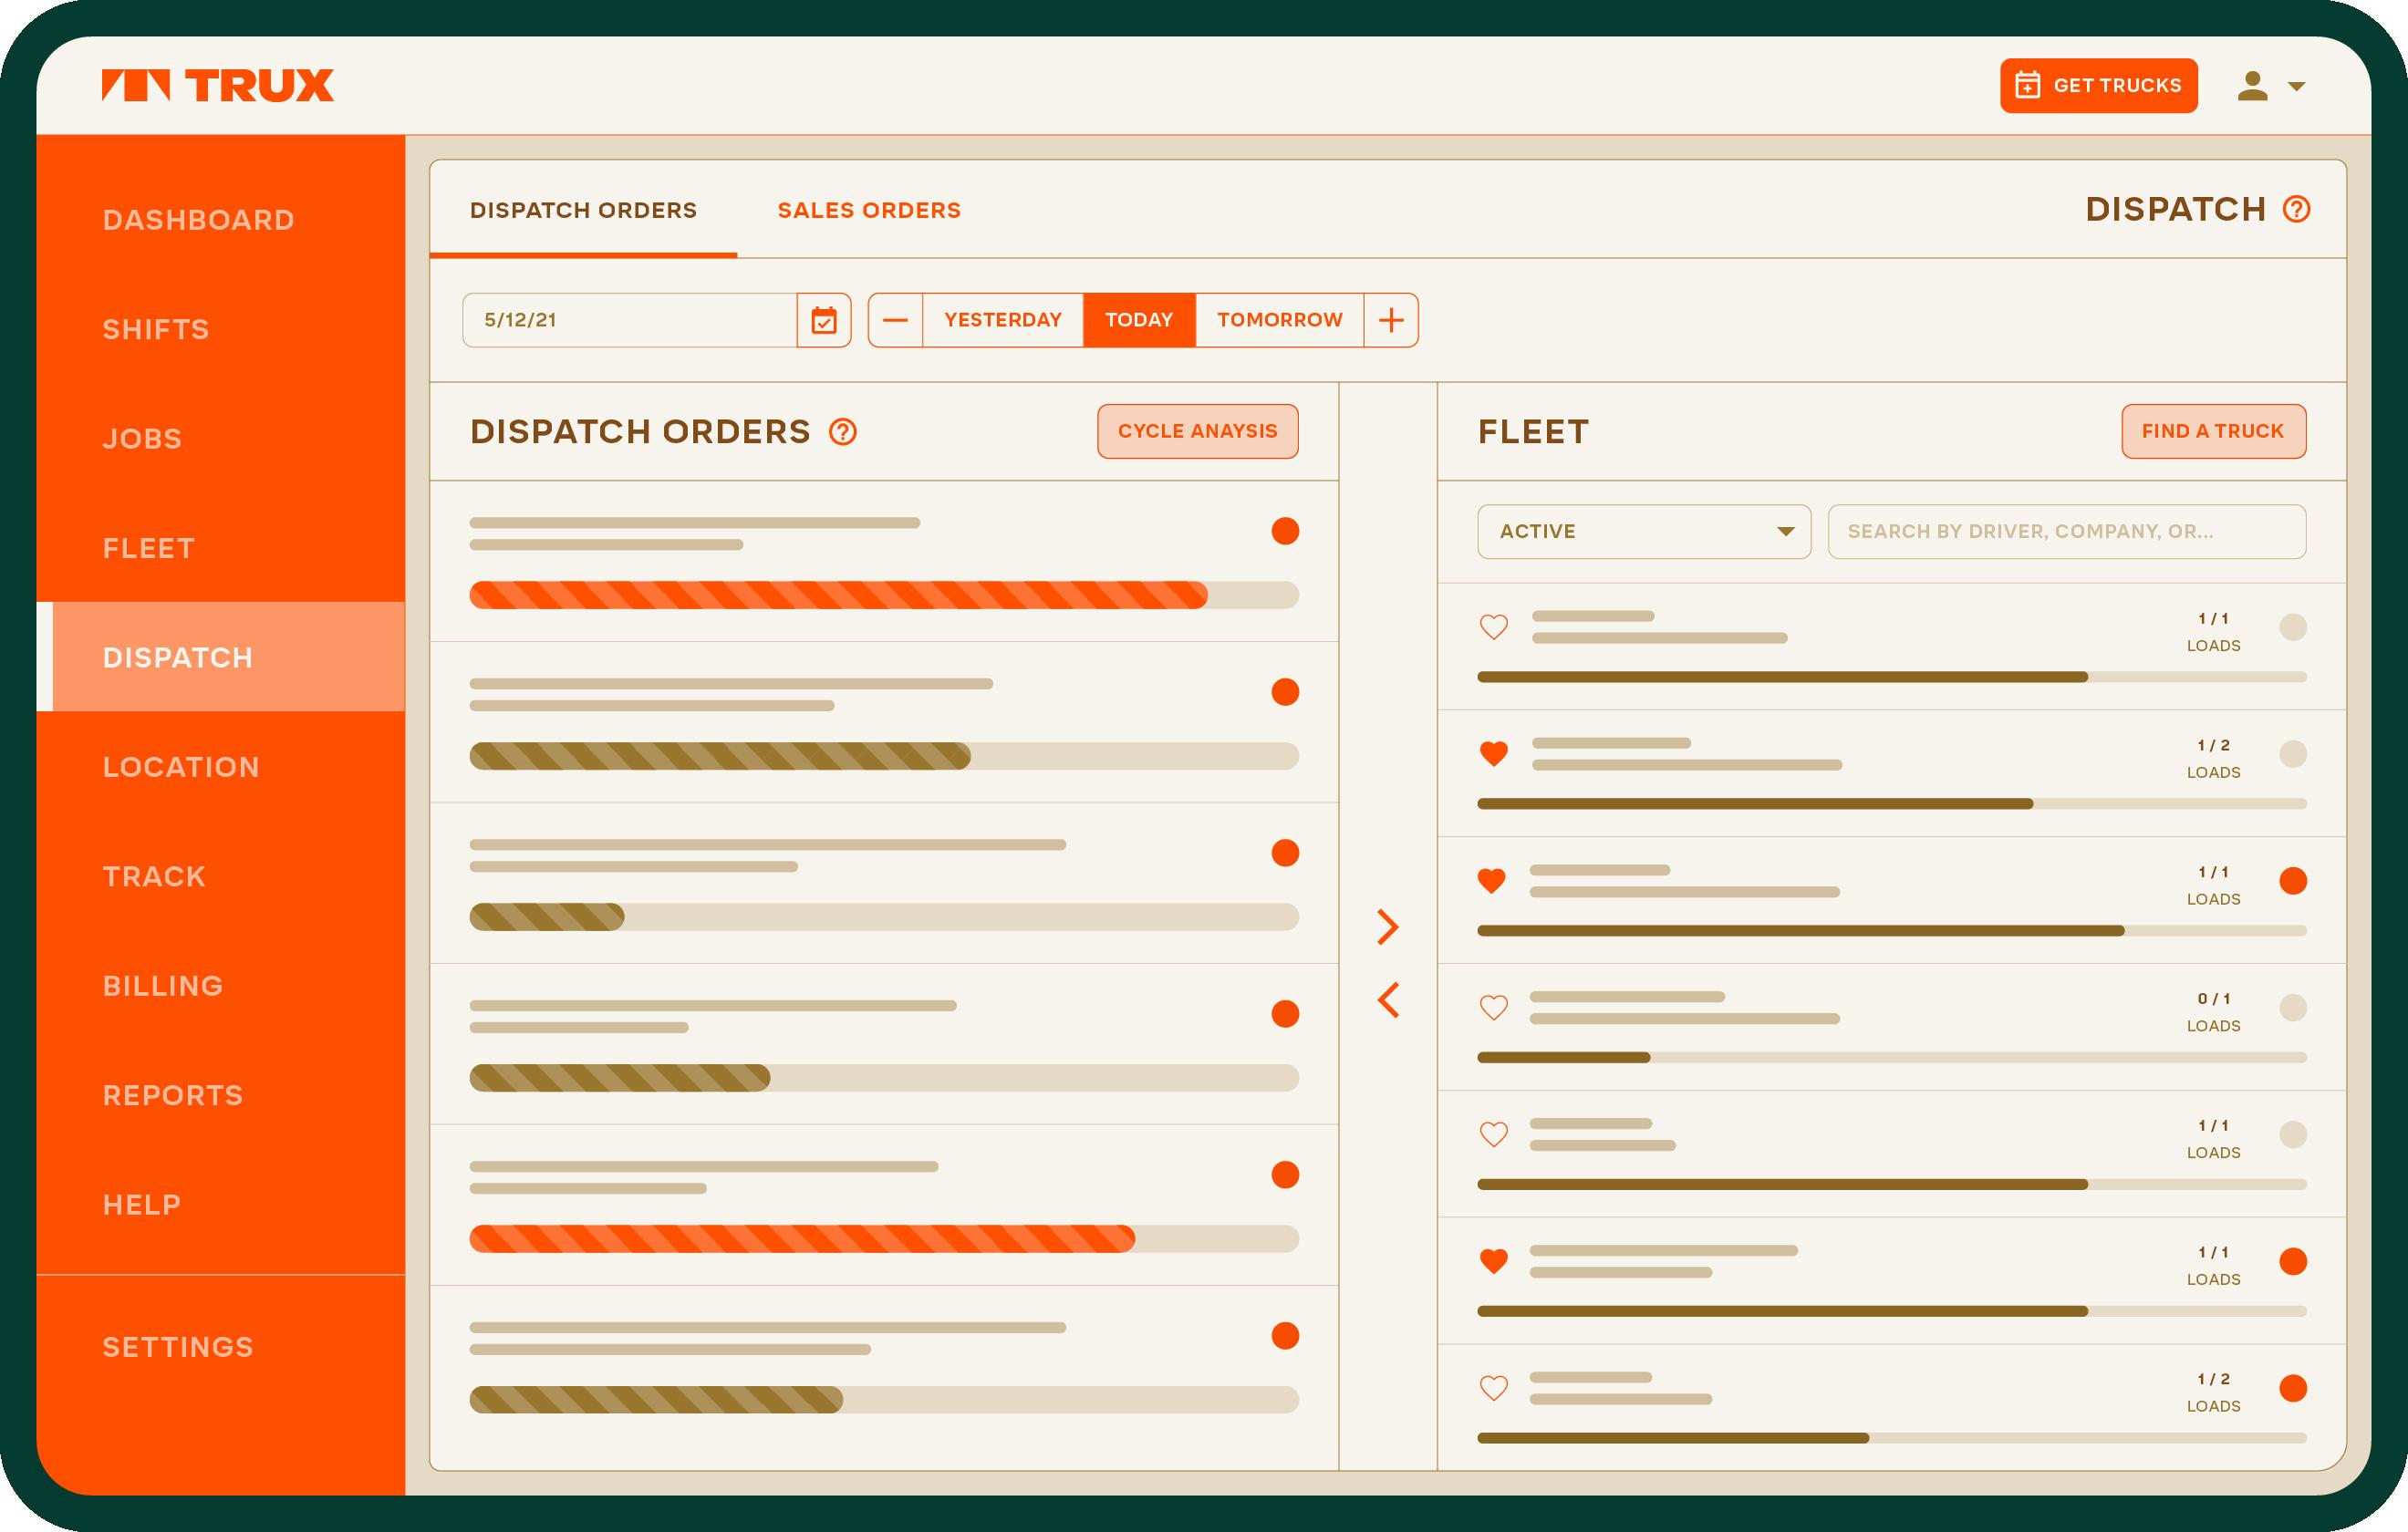 Trux_Product_Illustration_Dispatch_Deliver